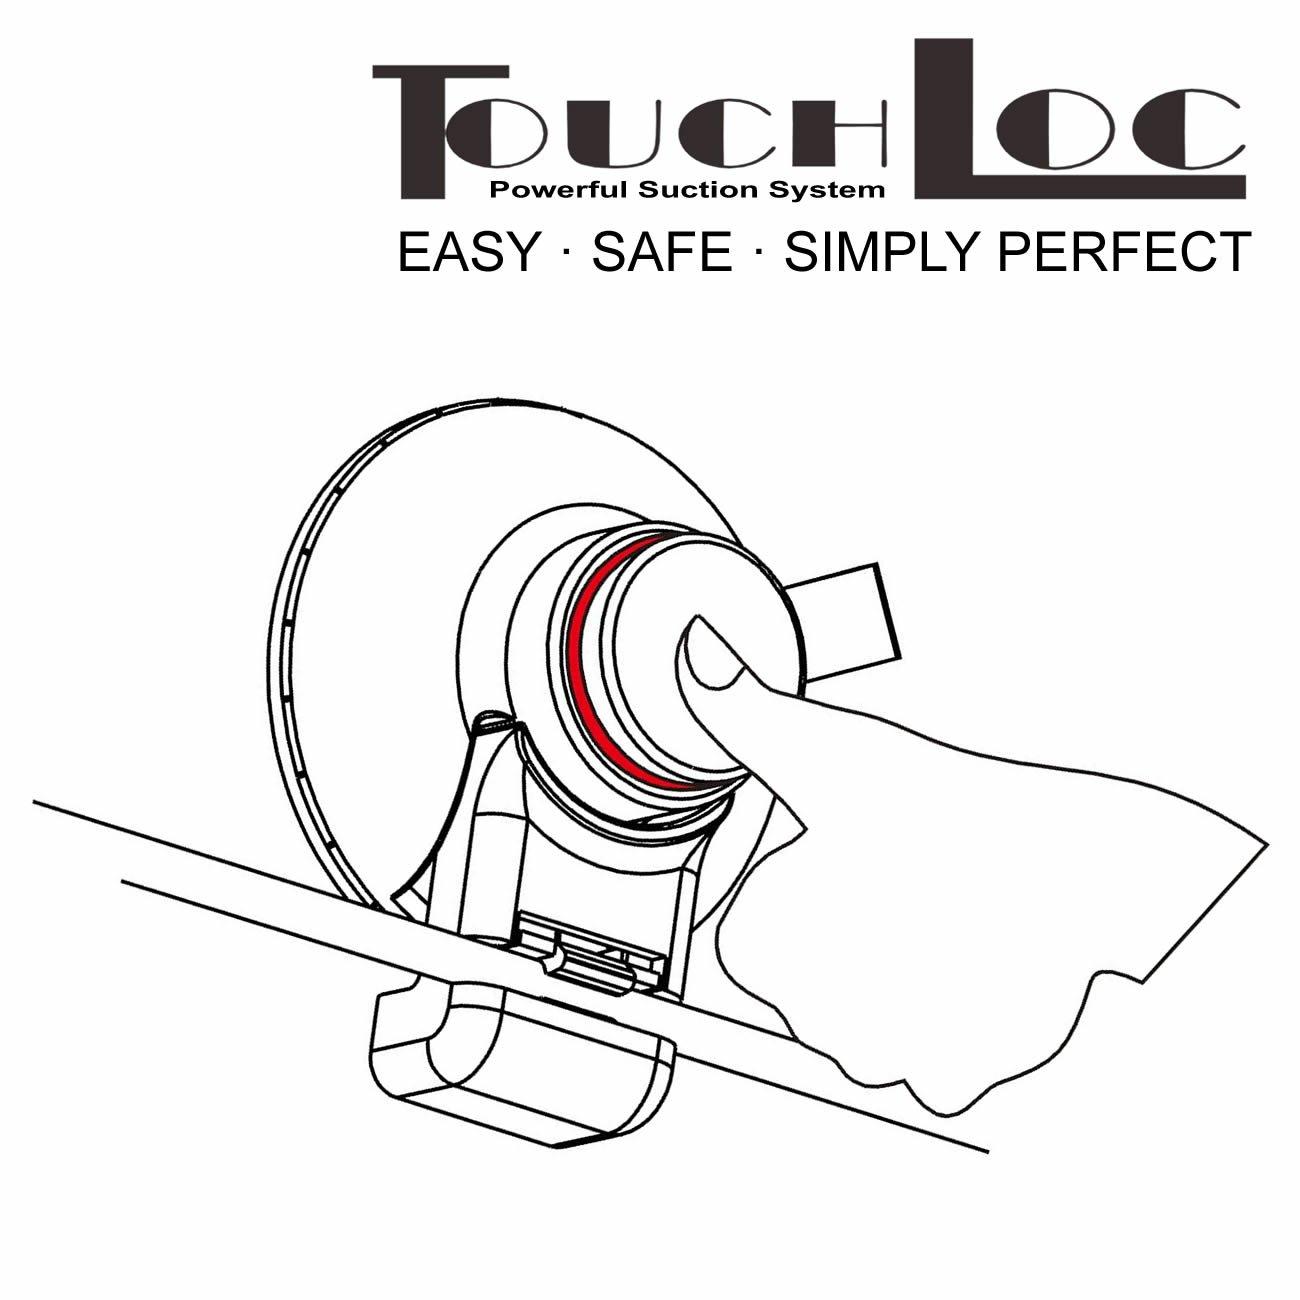 SMARDY Power TouchLoc Gancho Doble Ba/ño Ventosa Fijar sin taladrar f/ácil instalaci/ón Inoxidable